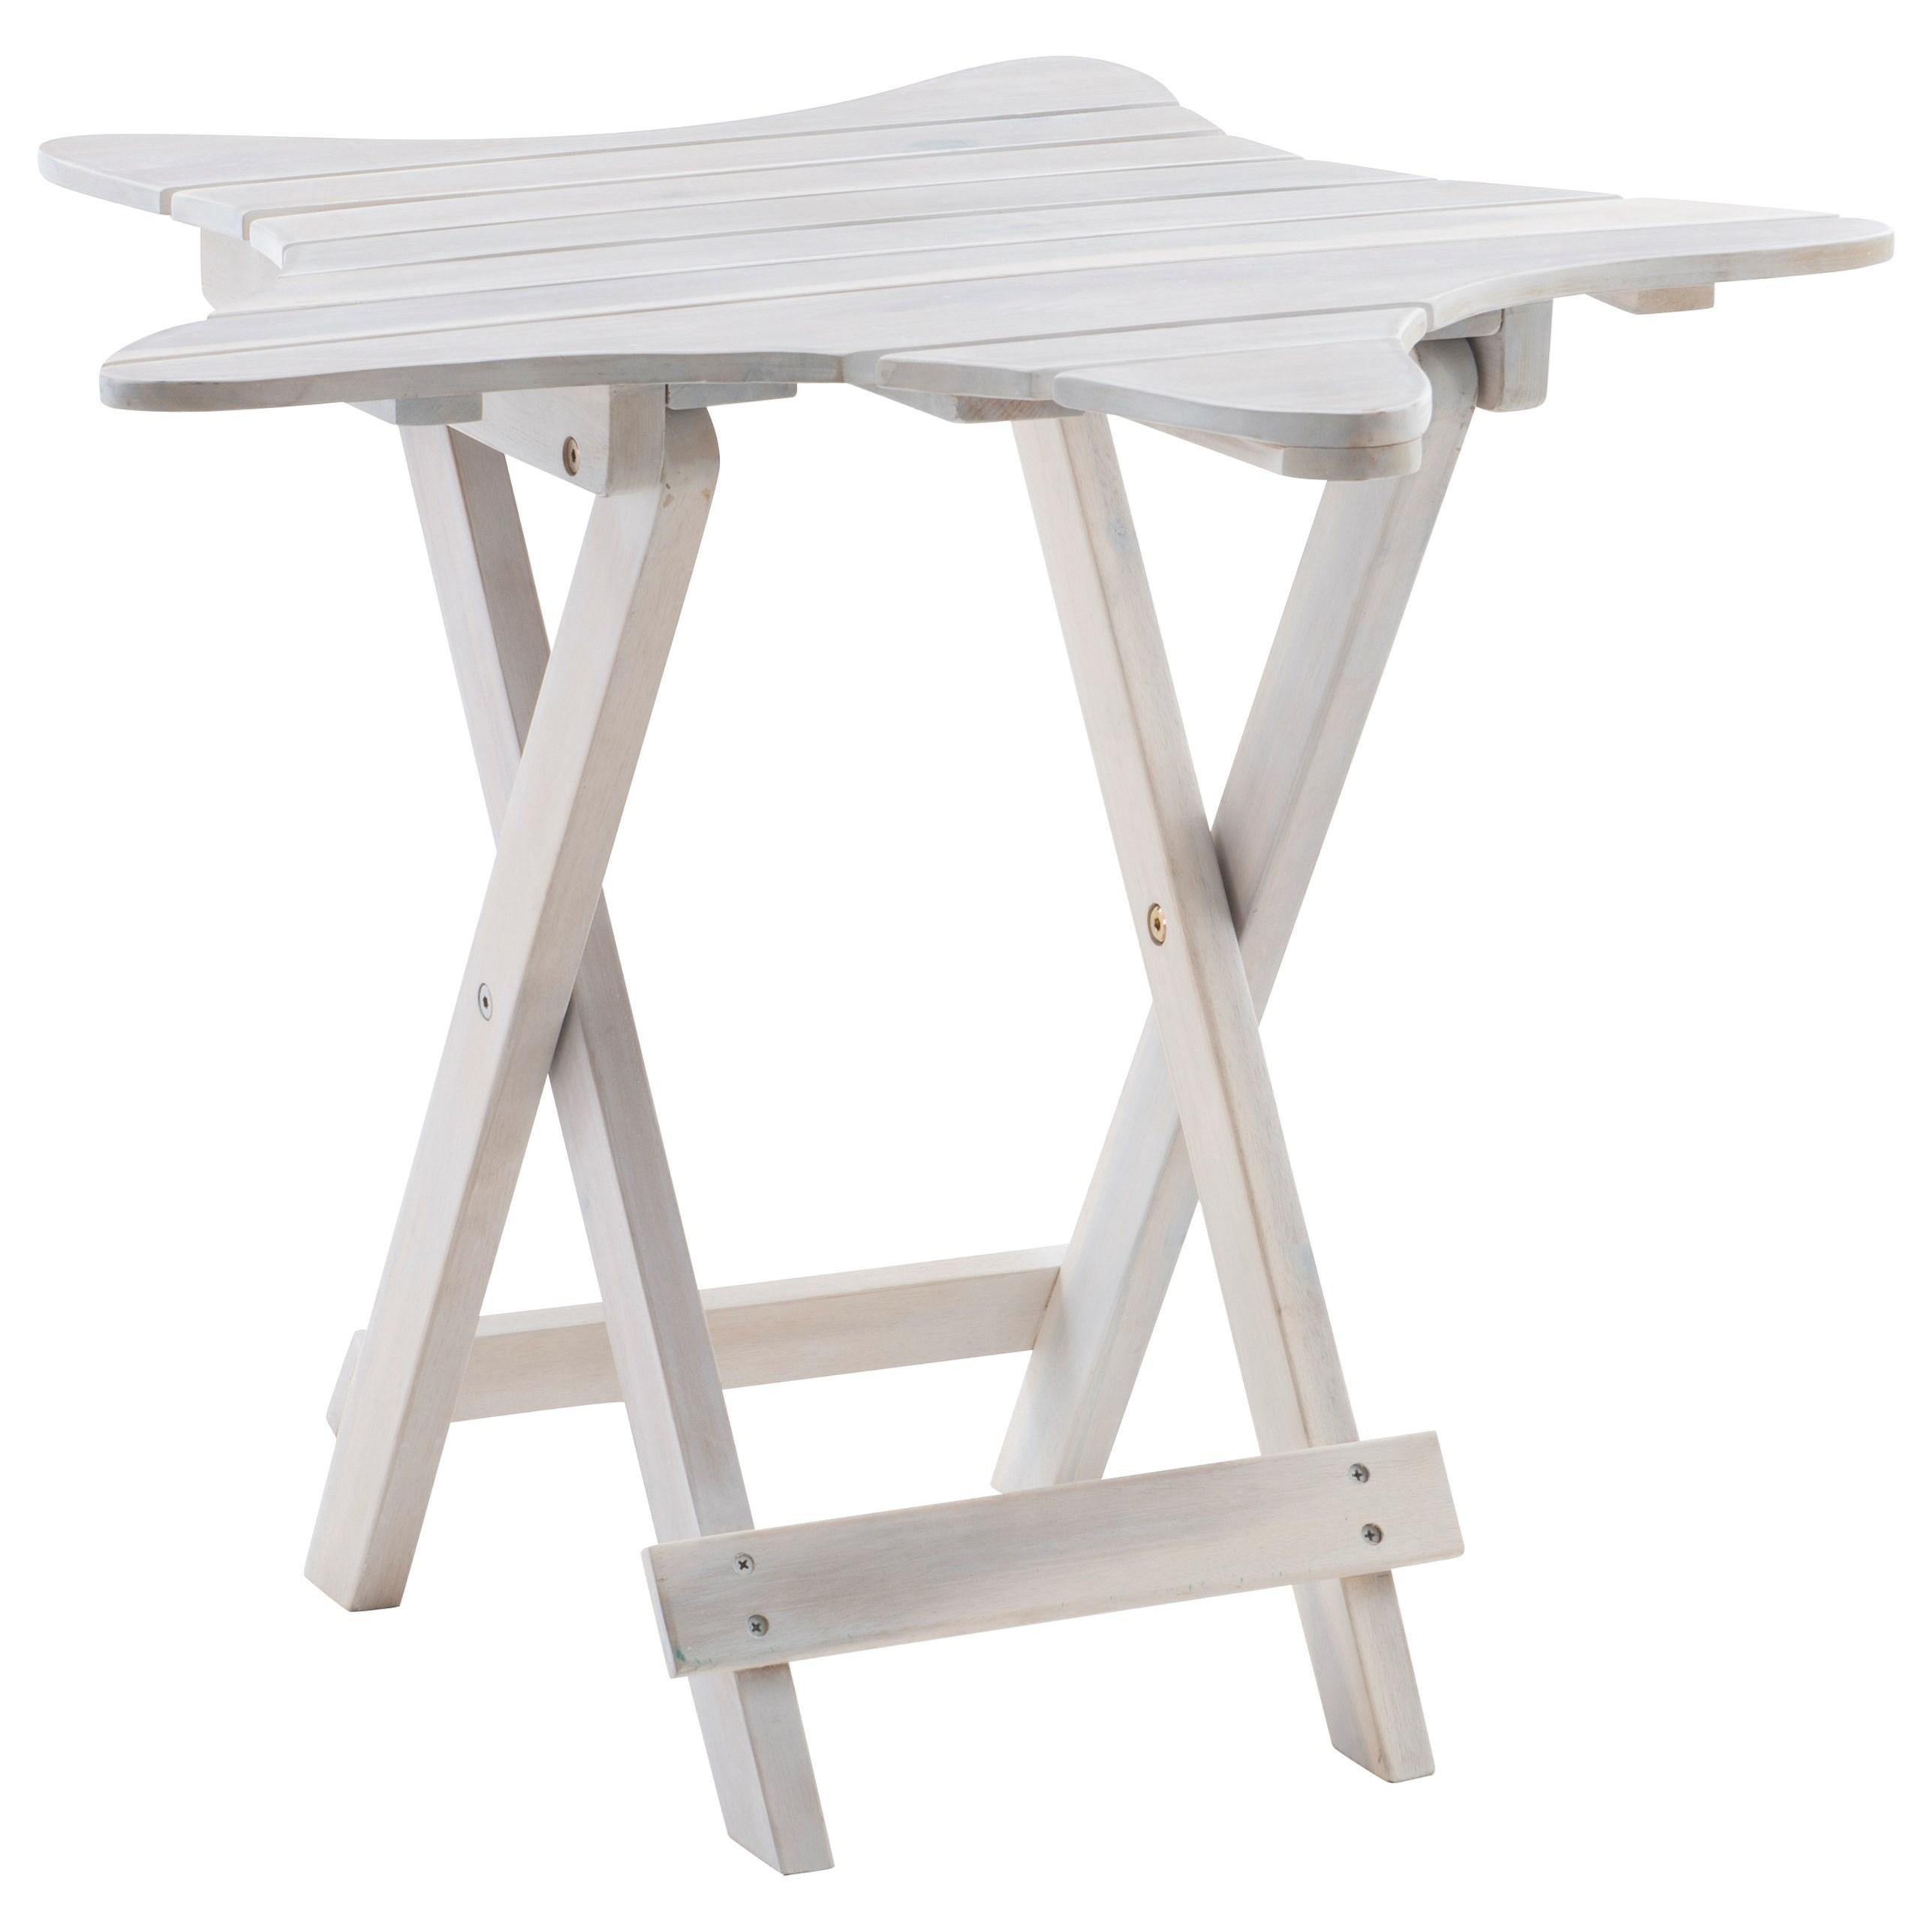 Stanbury Folding Table by Powell at Bullard Furniture